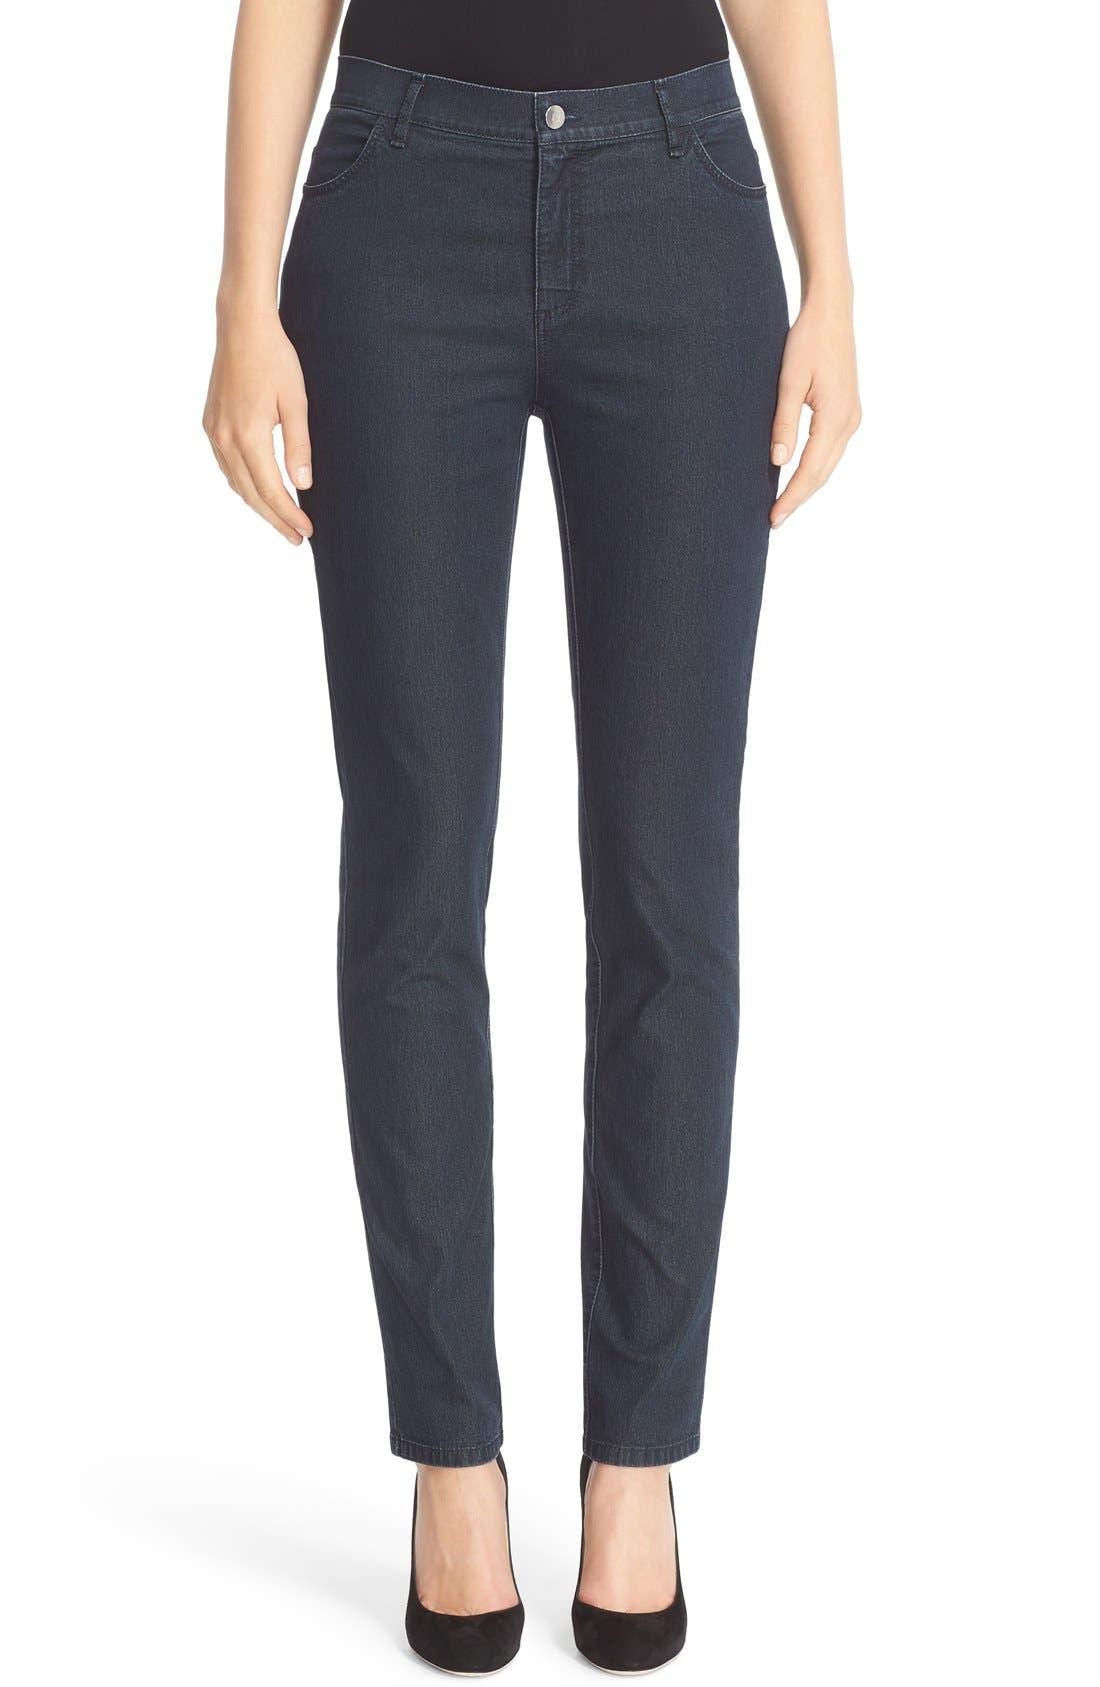 Alternate Image 1 Selected - Lafayette 148 New York 'Primo Denim' Curvy Fit Slim Leg Jeans